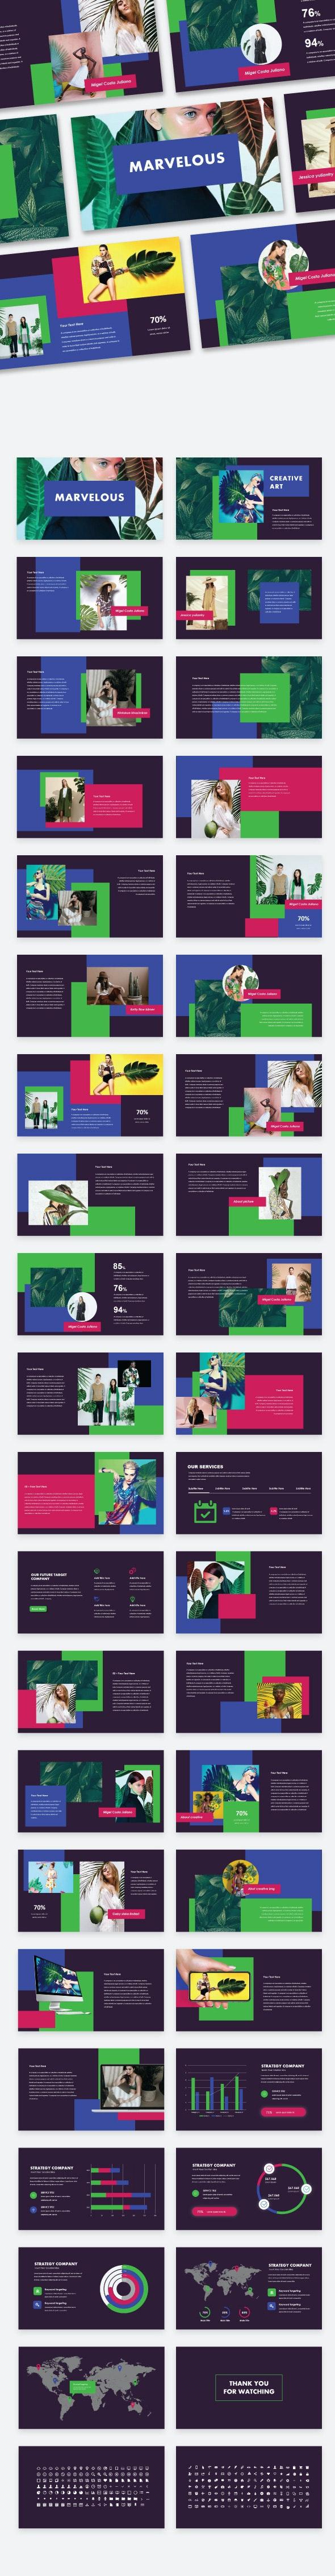 Marvelous - Creative & Colorful Google Slide Template - Google Slides Presentation Templates